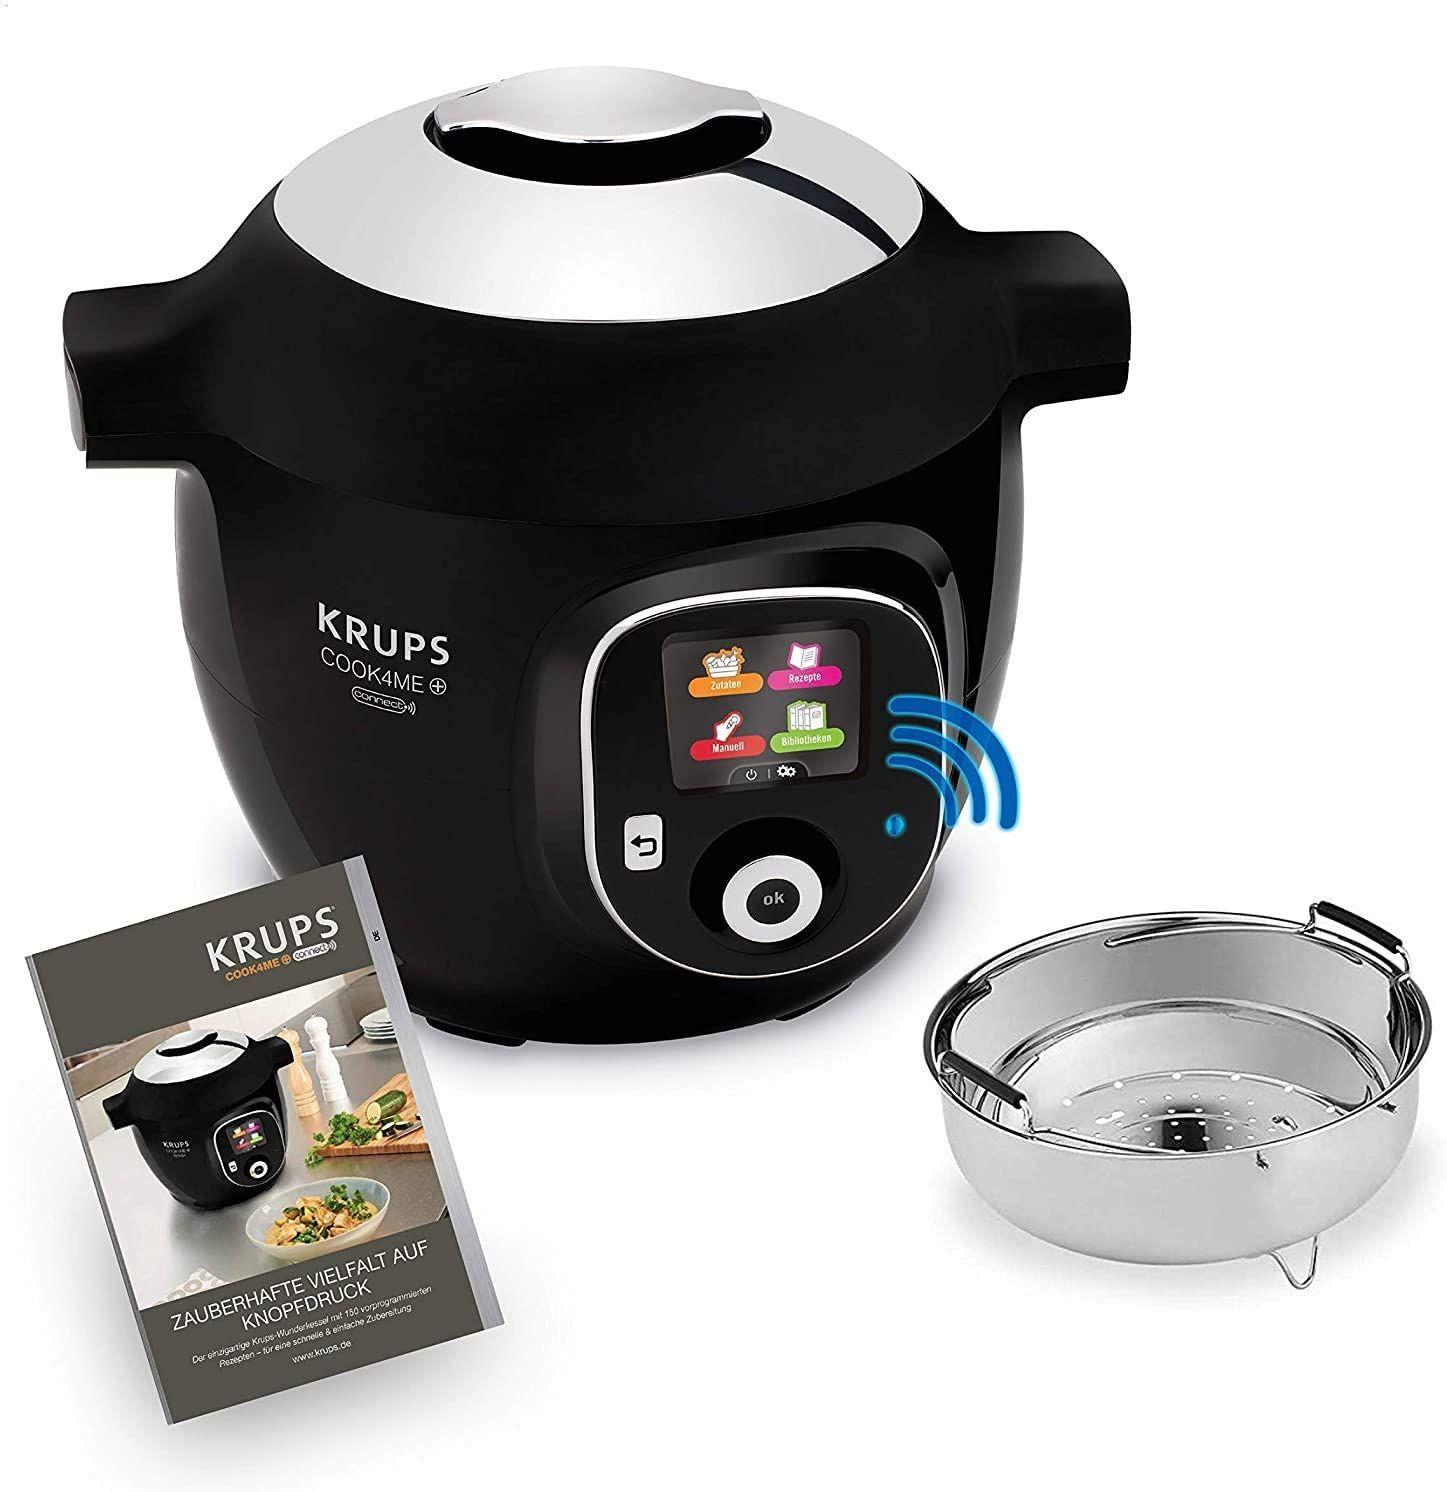 Krups CZ7158 Cook4Me+ Connect Multikocher (1600 Watt, elektrischer Schnellkochtopf, Bluetooth Steuerung, 4 Liter) [Amazon]